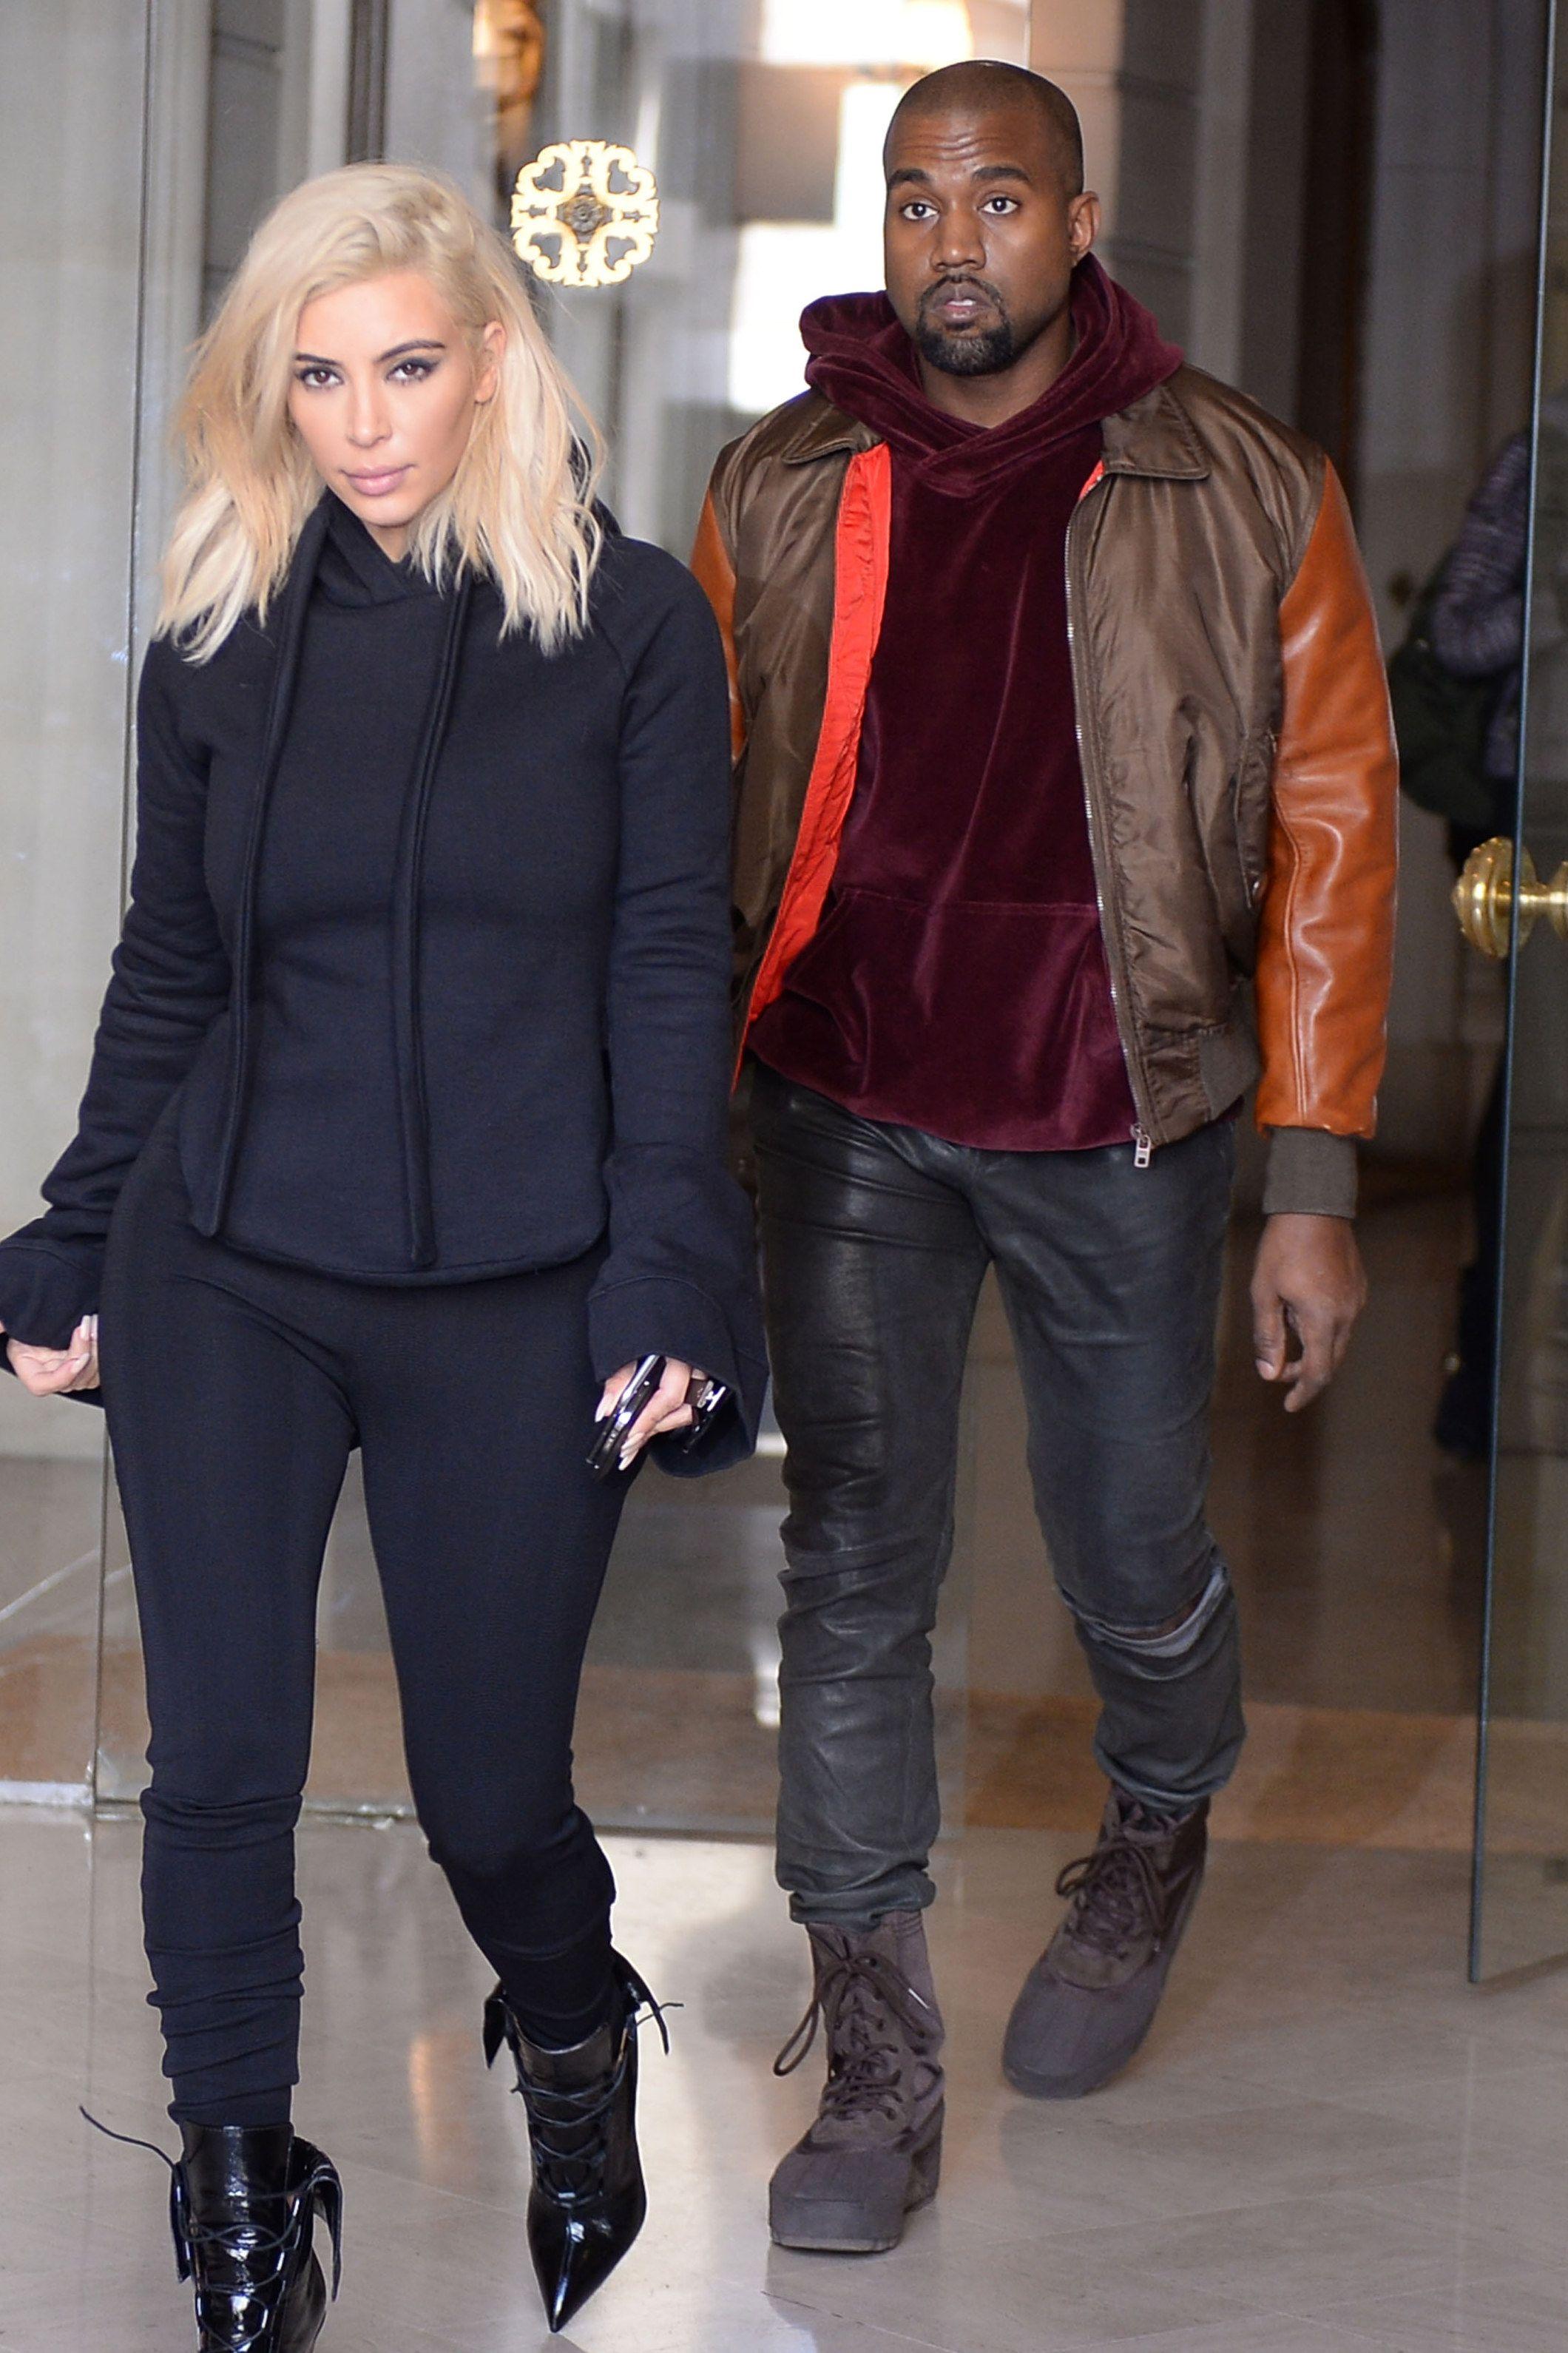 Pin By Rg Rm On Kanye Fashion Kanye West Outfits Kanye Fashion Kanye West Style